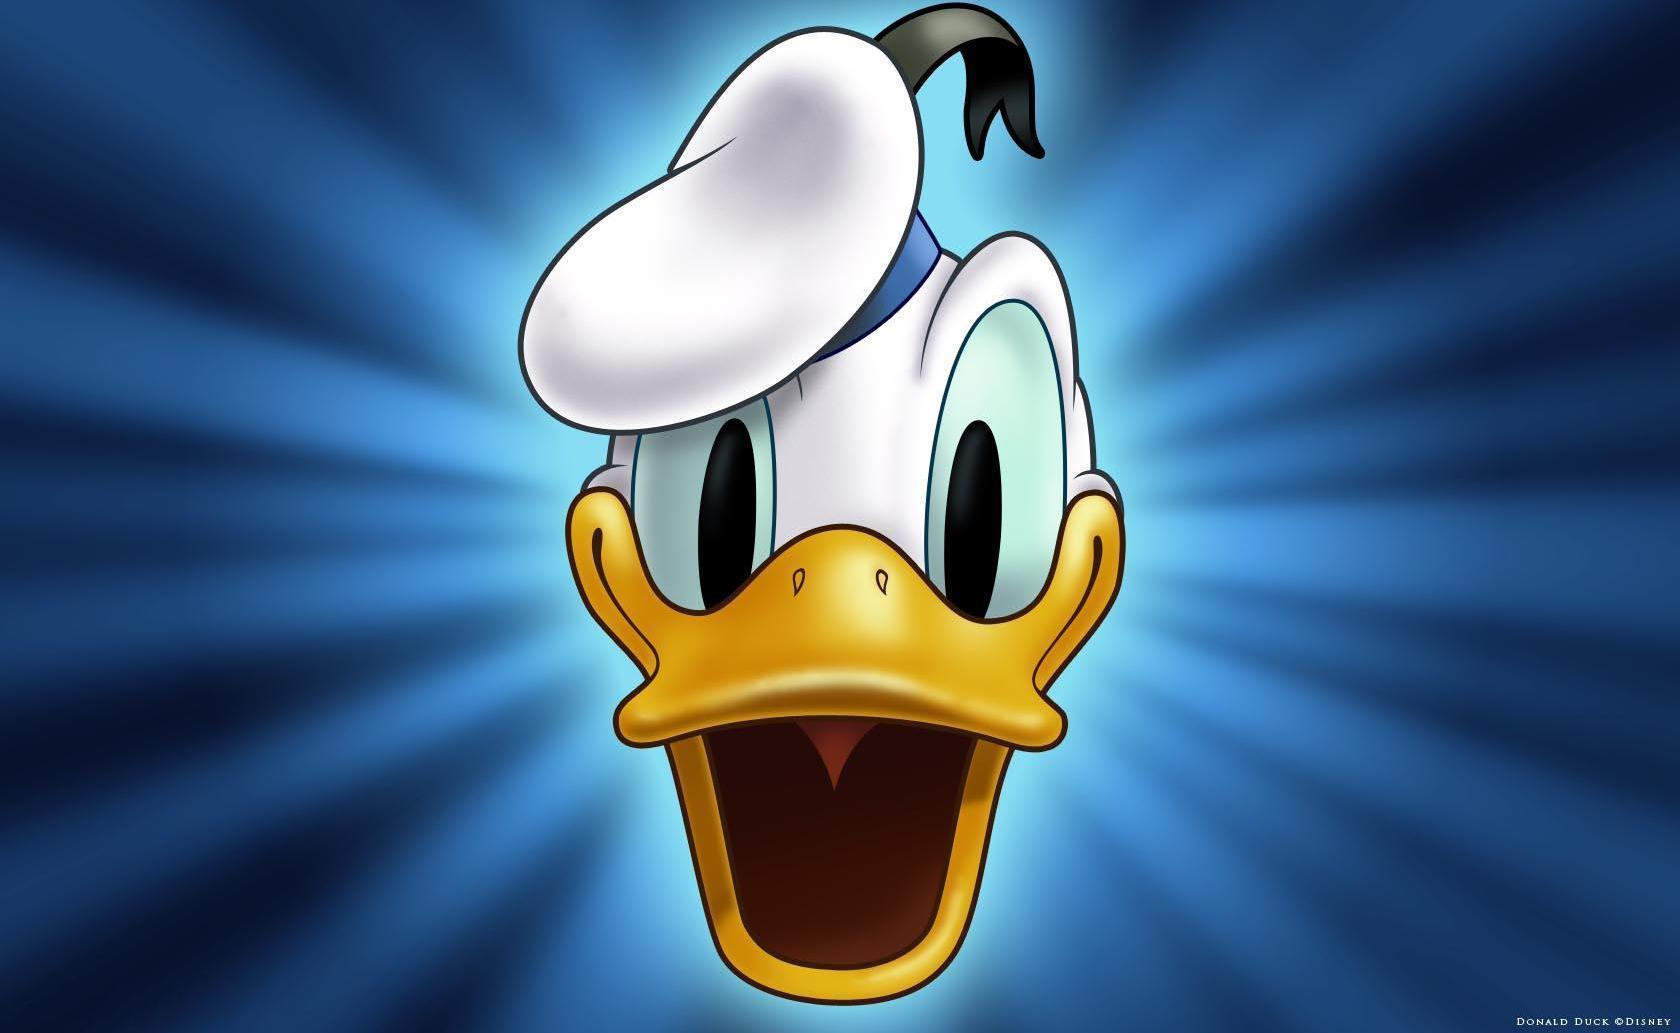 Download mobile wallpaper Cartoon, Walt Disney for free.